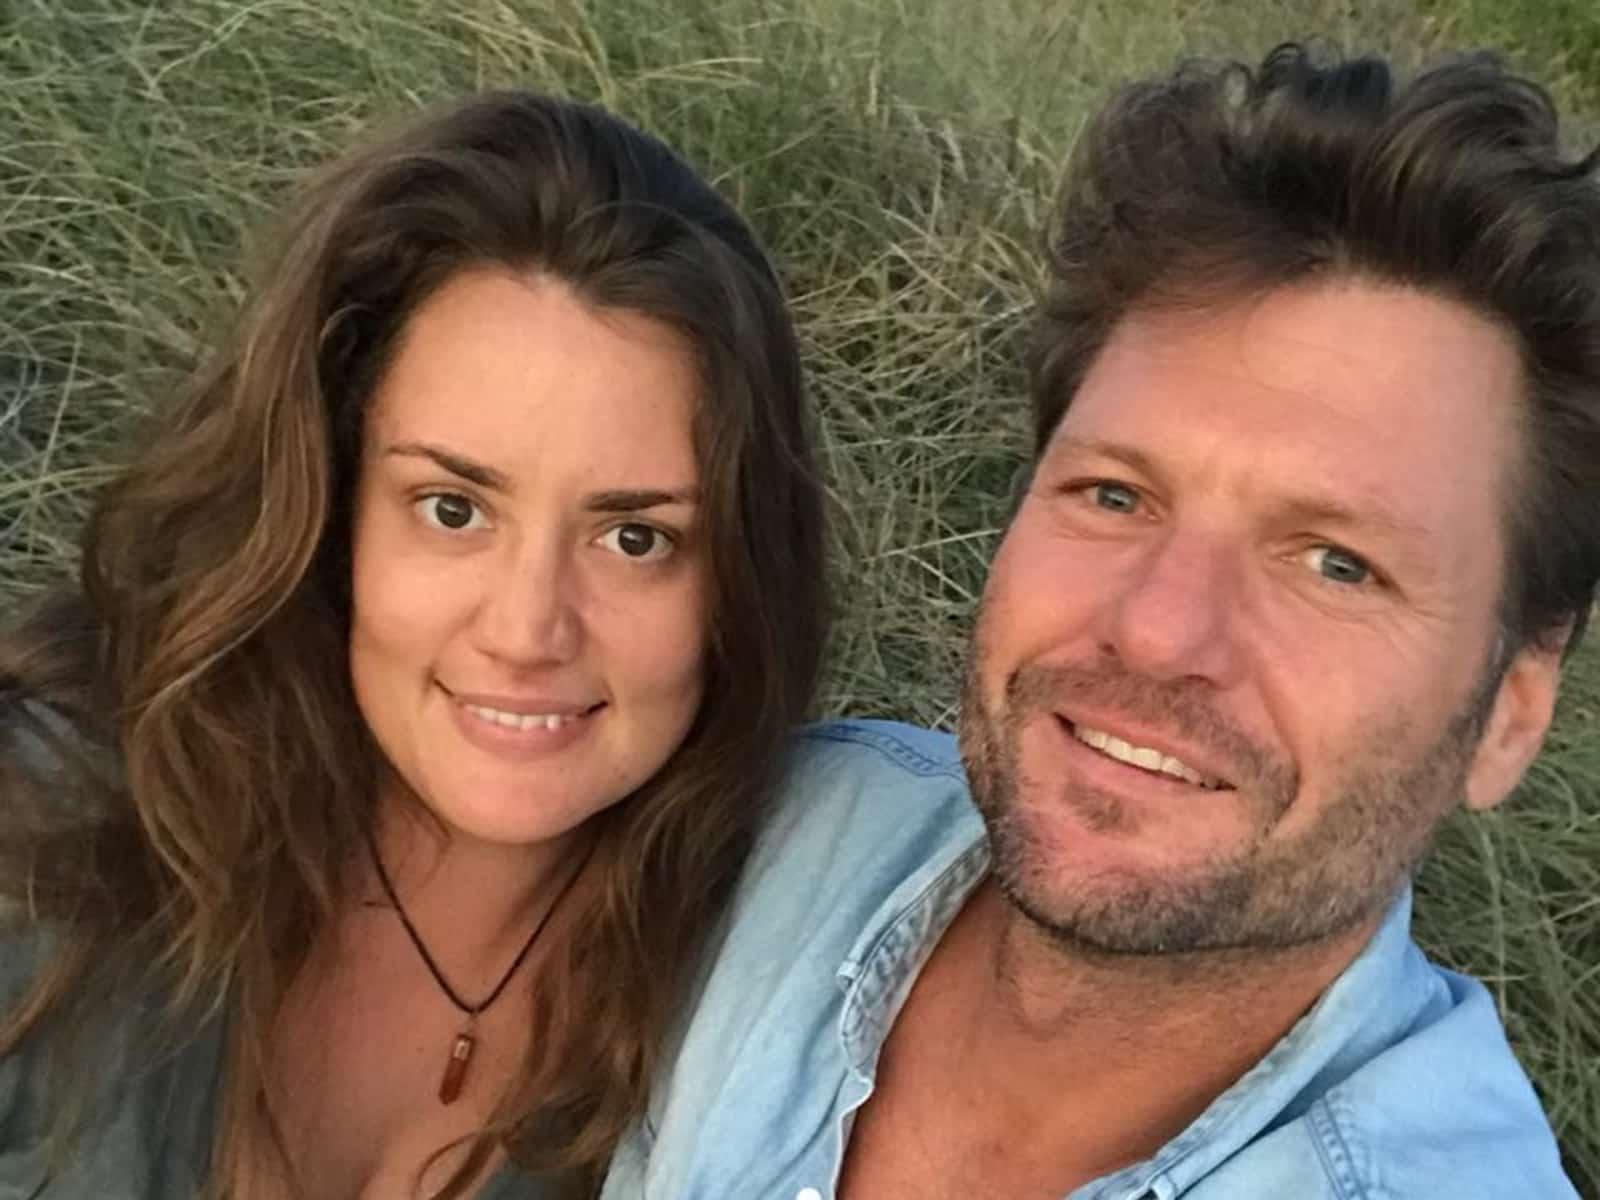 Adam & Danica from Perth, Western Australia, Australia